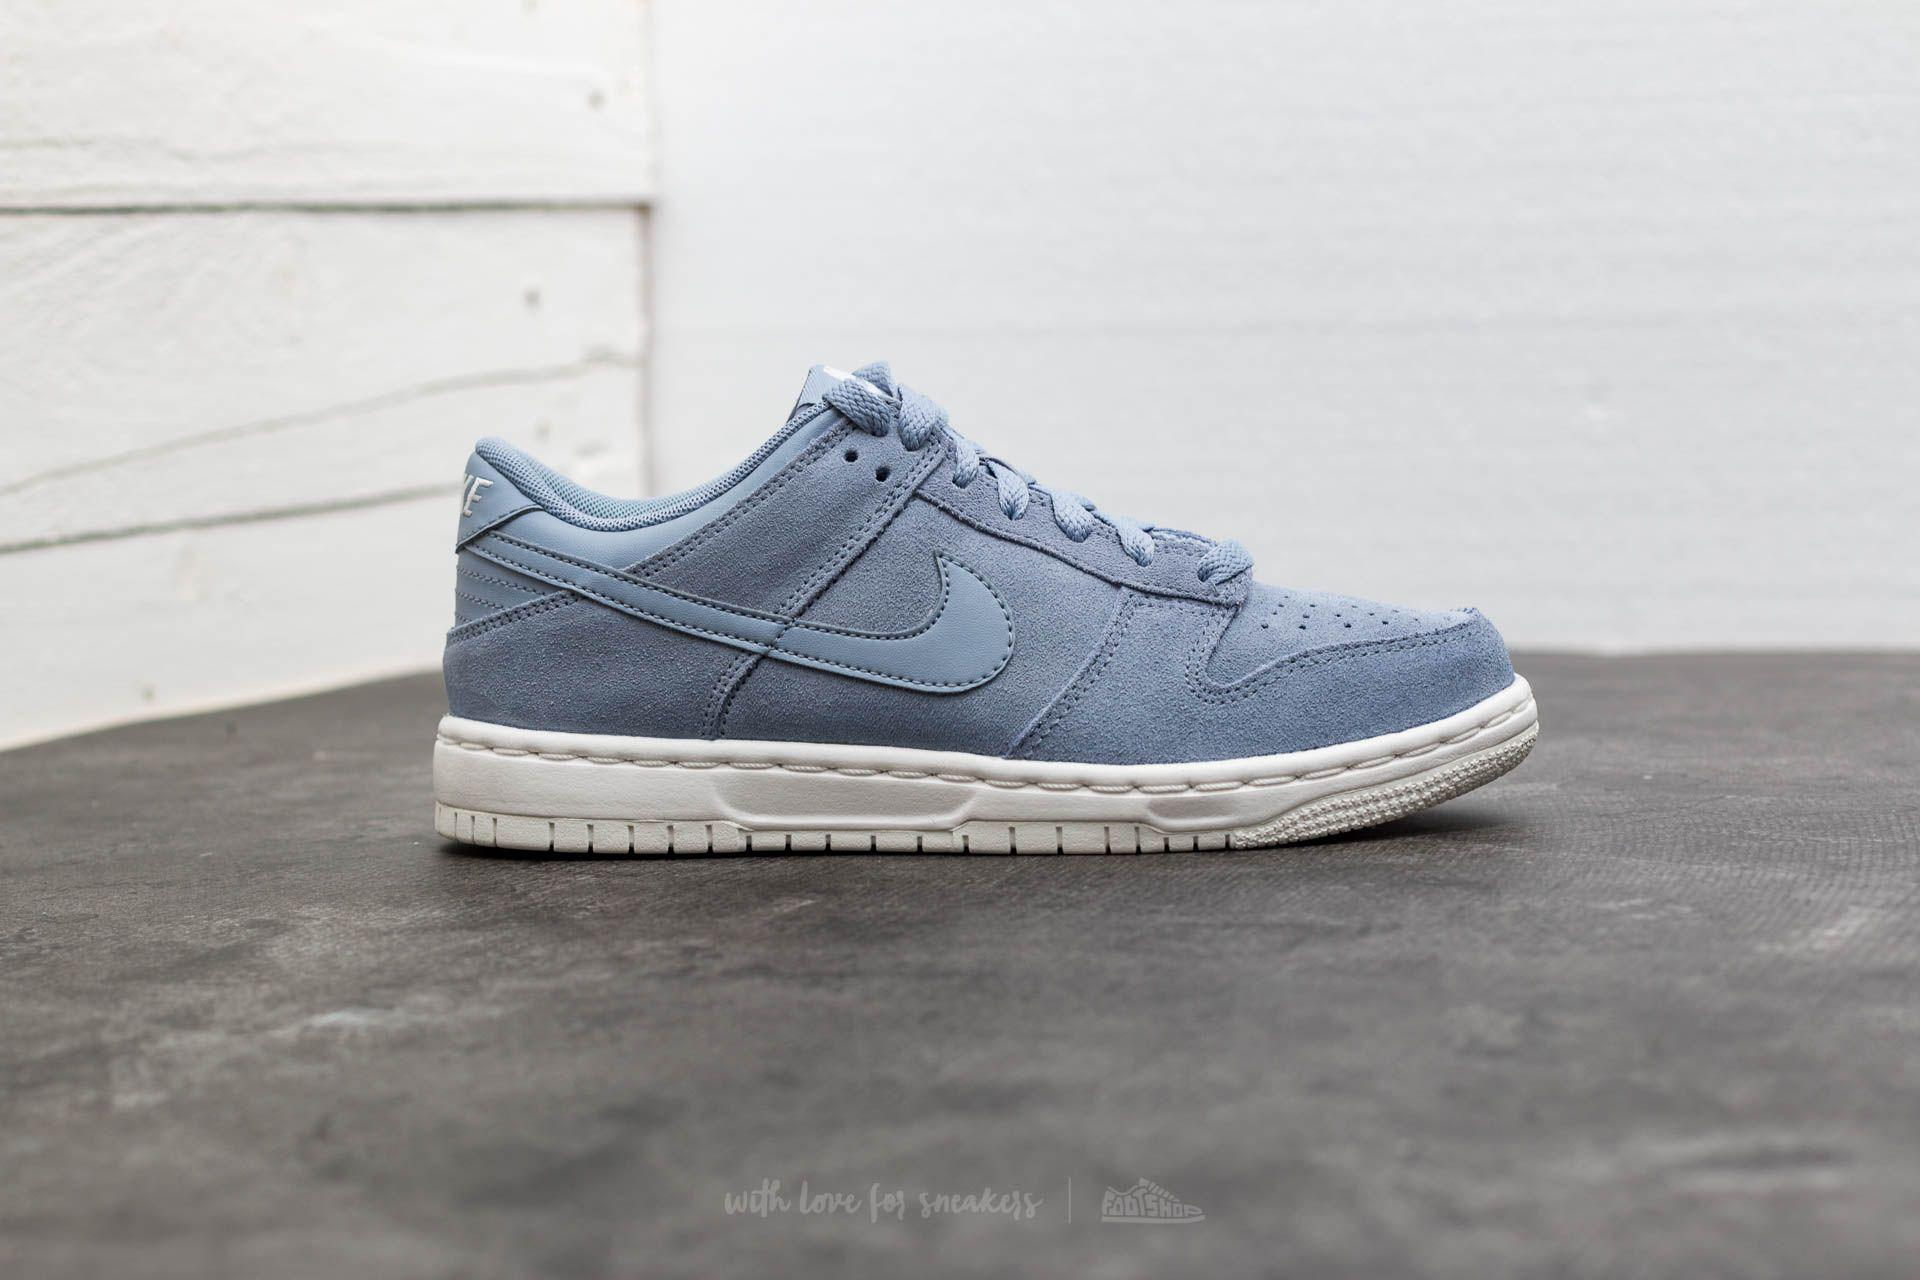 f2aed81b0a2 Lyst - Nike Dunk Low Se (gs) Glacier Grey  Glacier Grey in Gray for Men